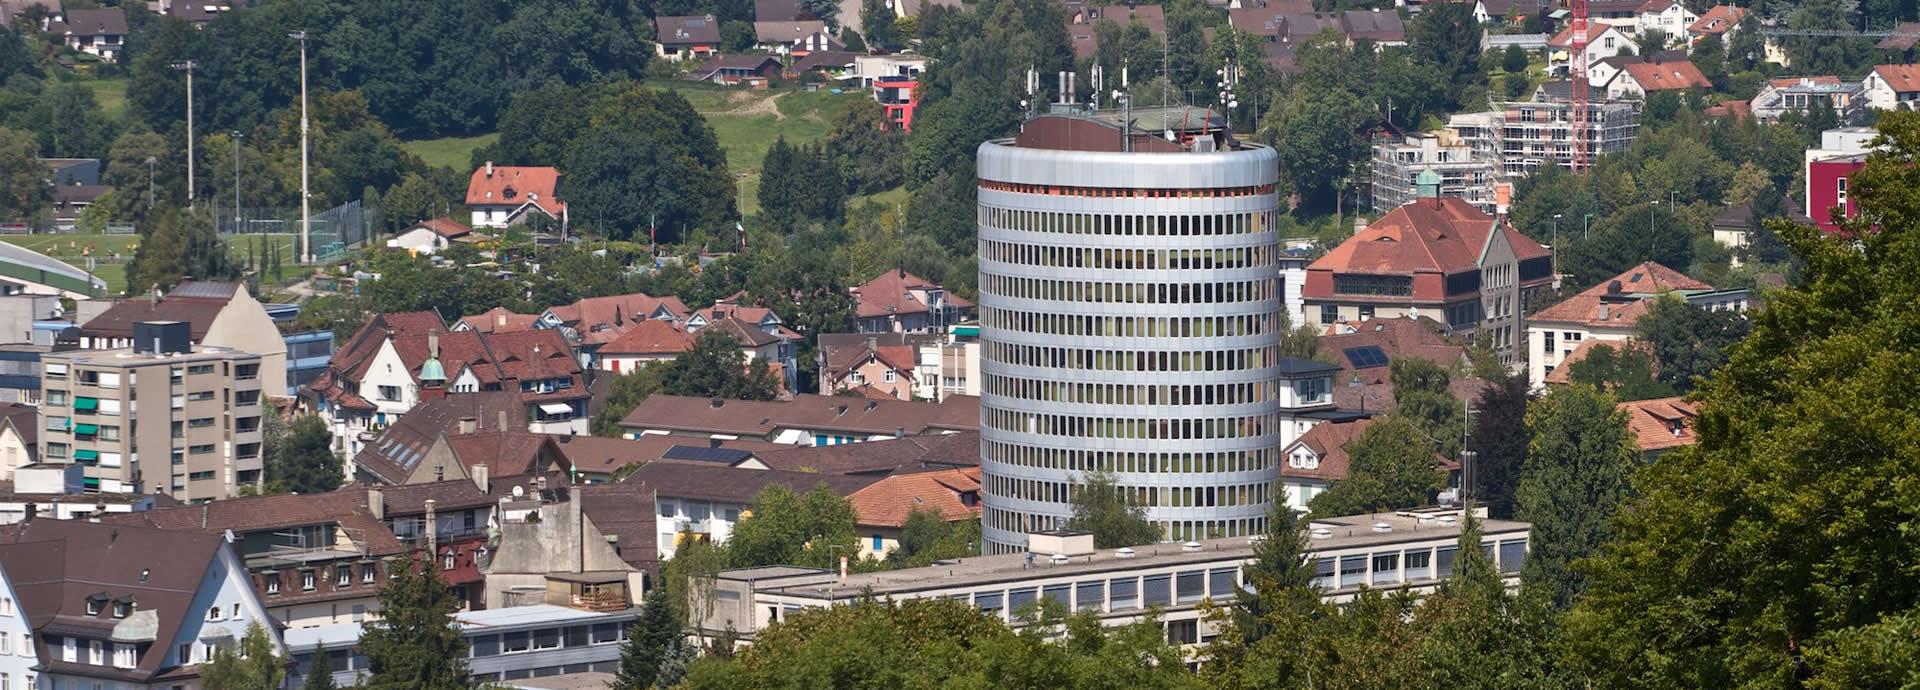 Silberturm St. Gallen Ostschweiz